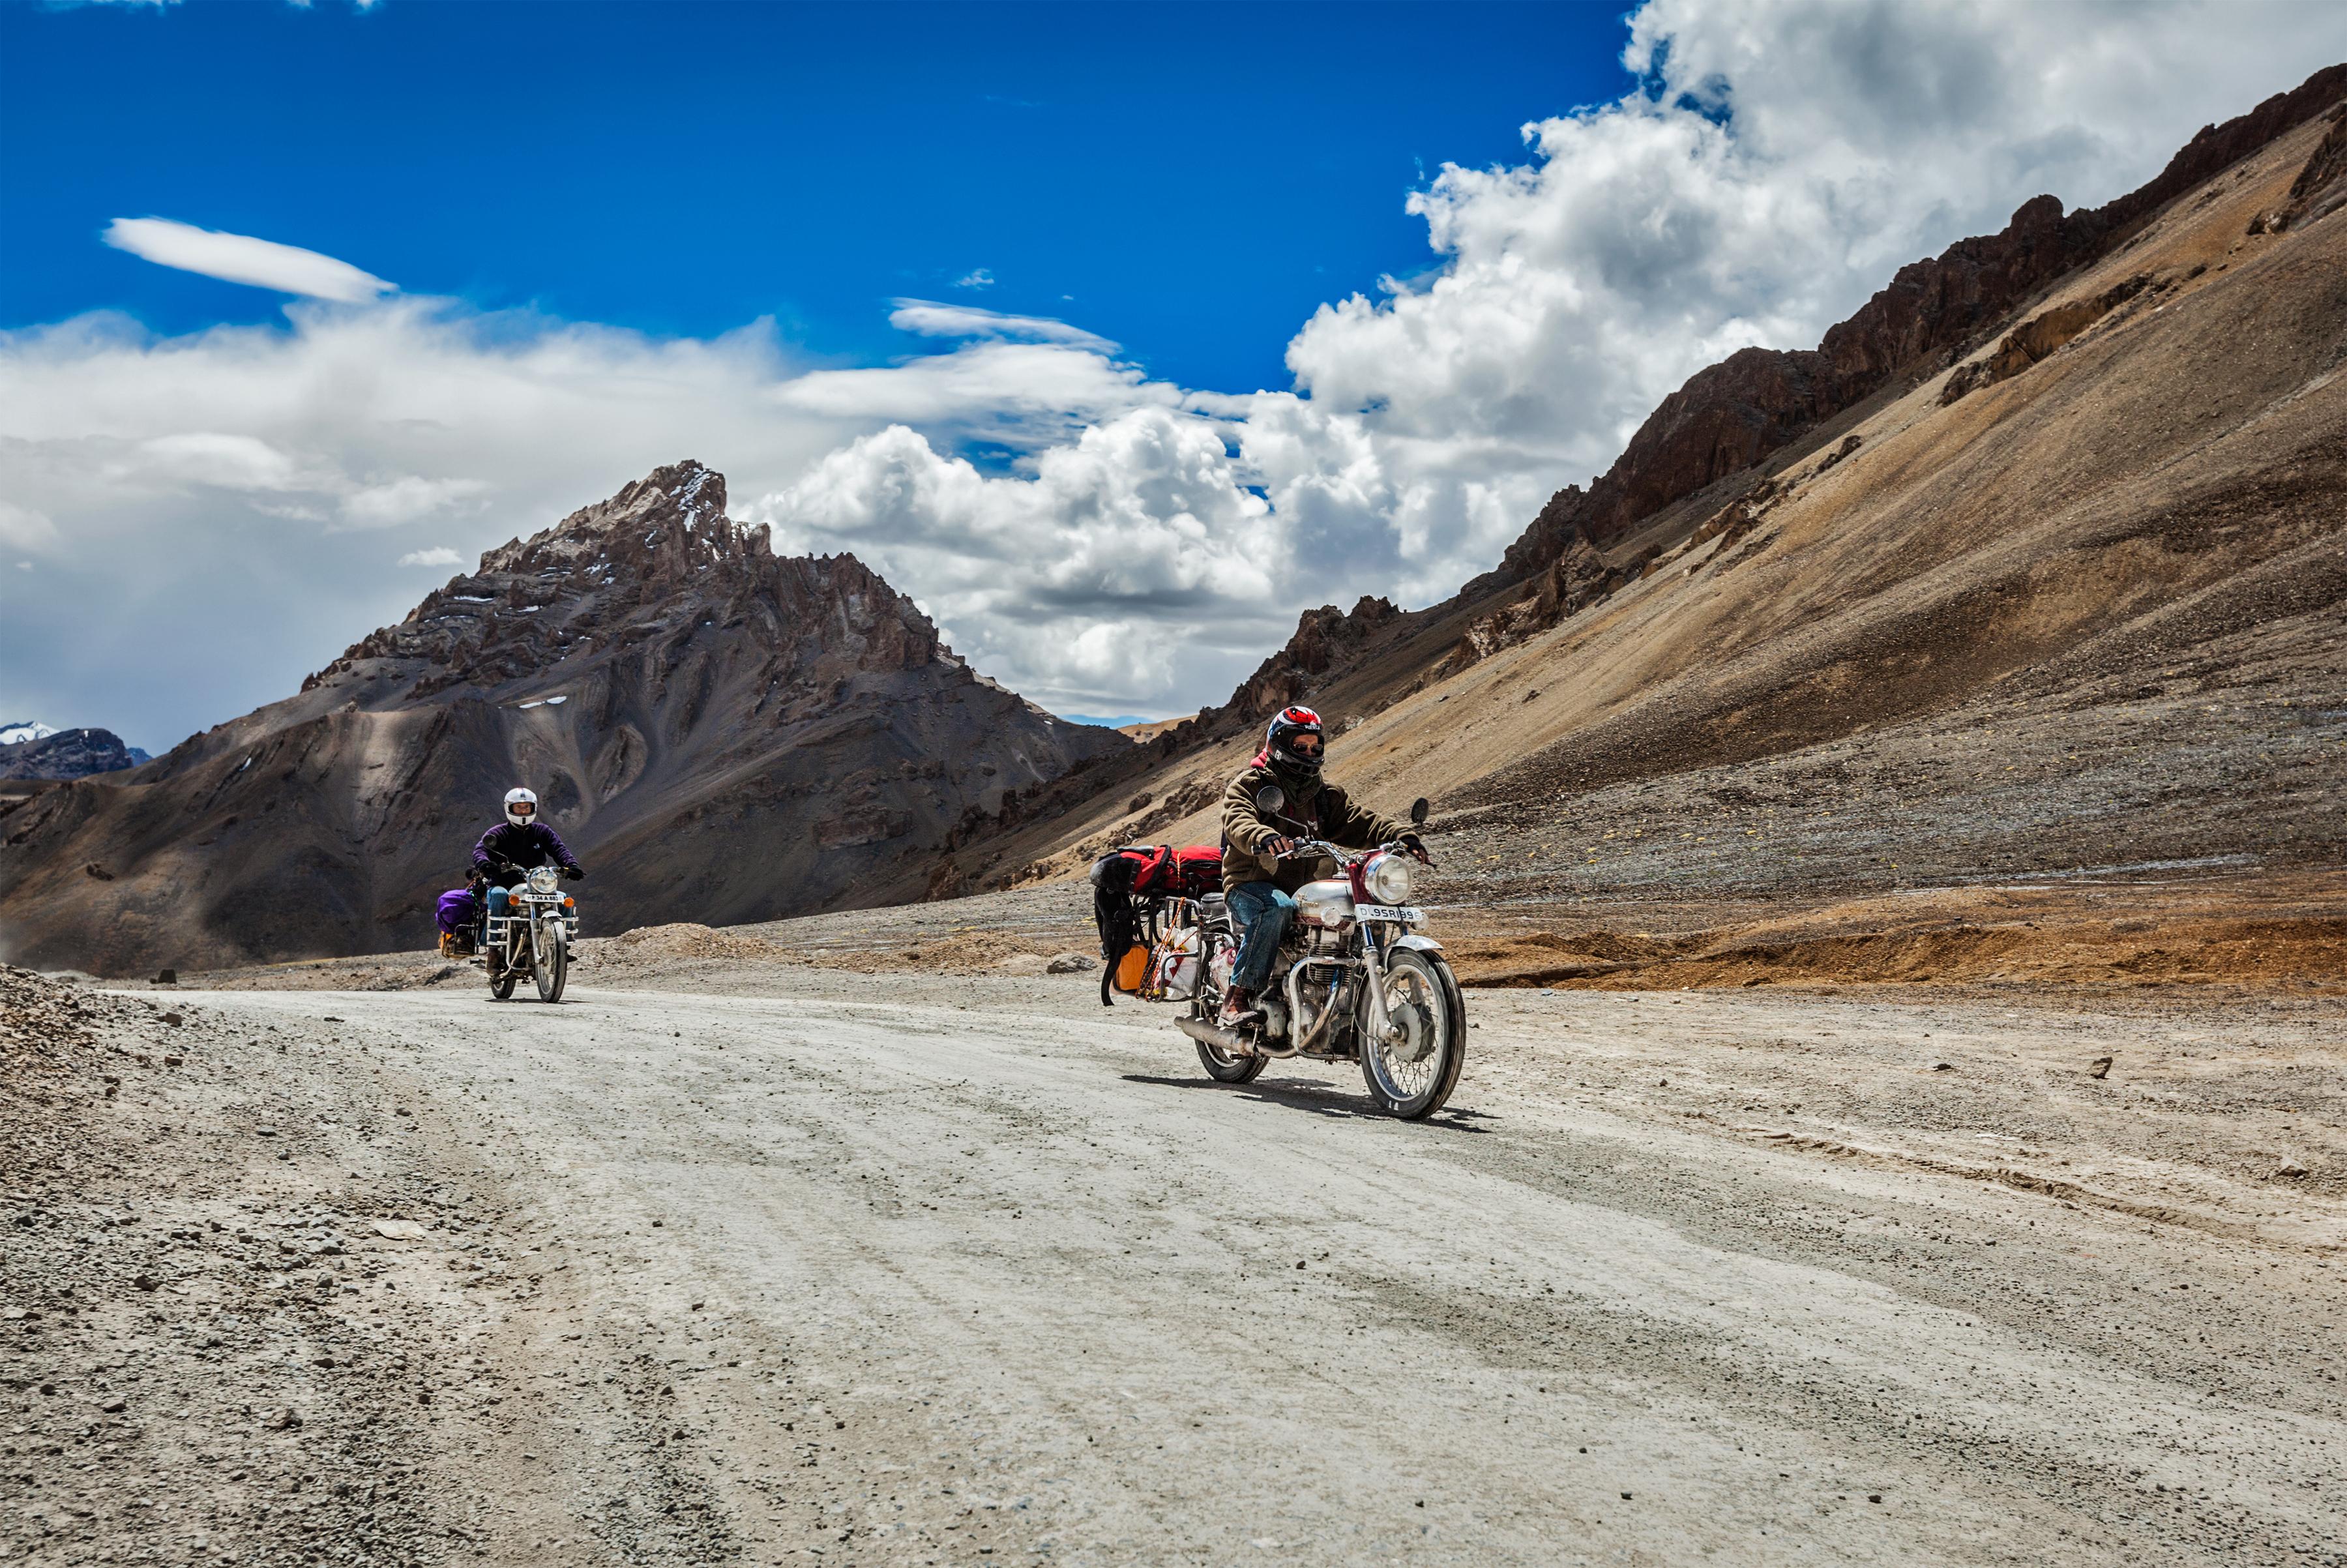 Bike tourists in Himalayas on famous high altitude Leh-Manali Highway. Himalayan bike tourism is gai